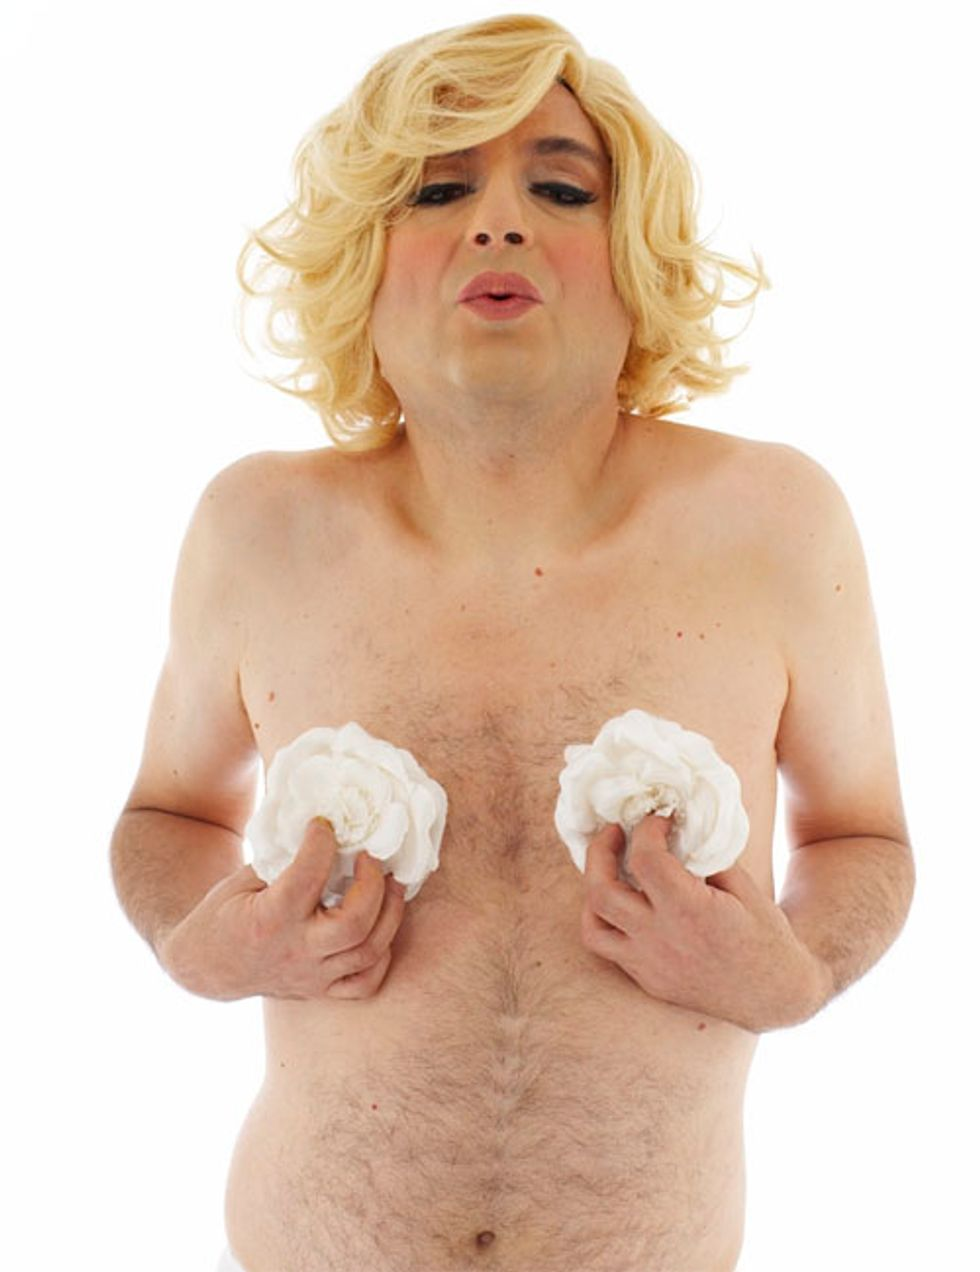 Michael Musto Is Lindsay Is Marilyn